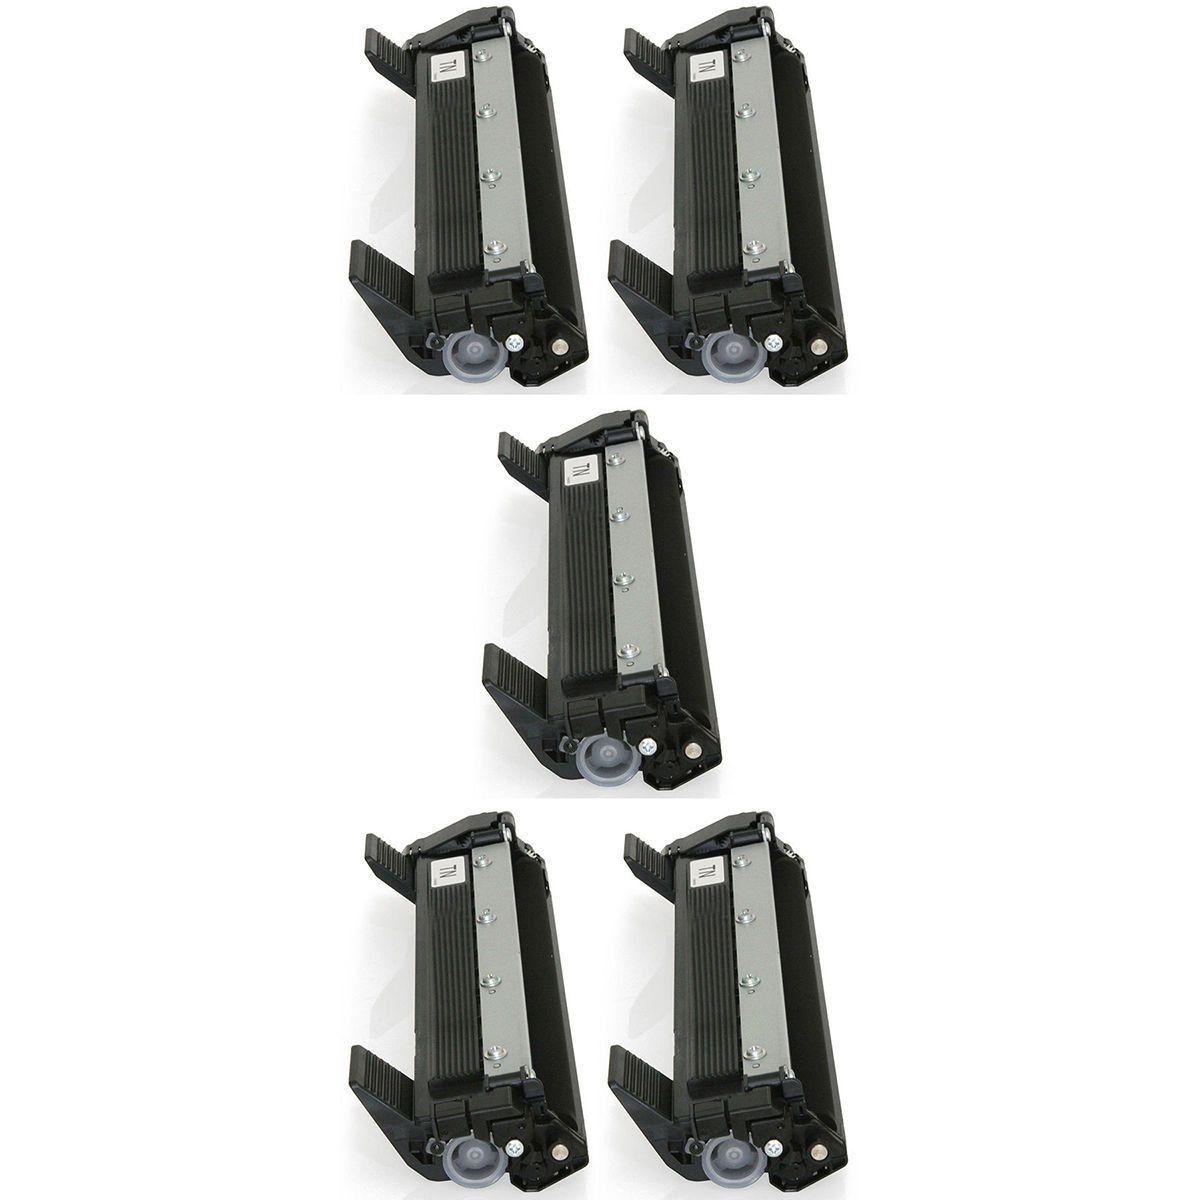 Compatível: Kit 5x Toner TN1000 TN1060 para Brother DCP-1617nw 1512r HL1212 HL1210w HL1212w DCP1617nw / Preto / 1.000